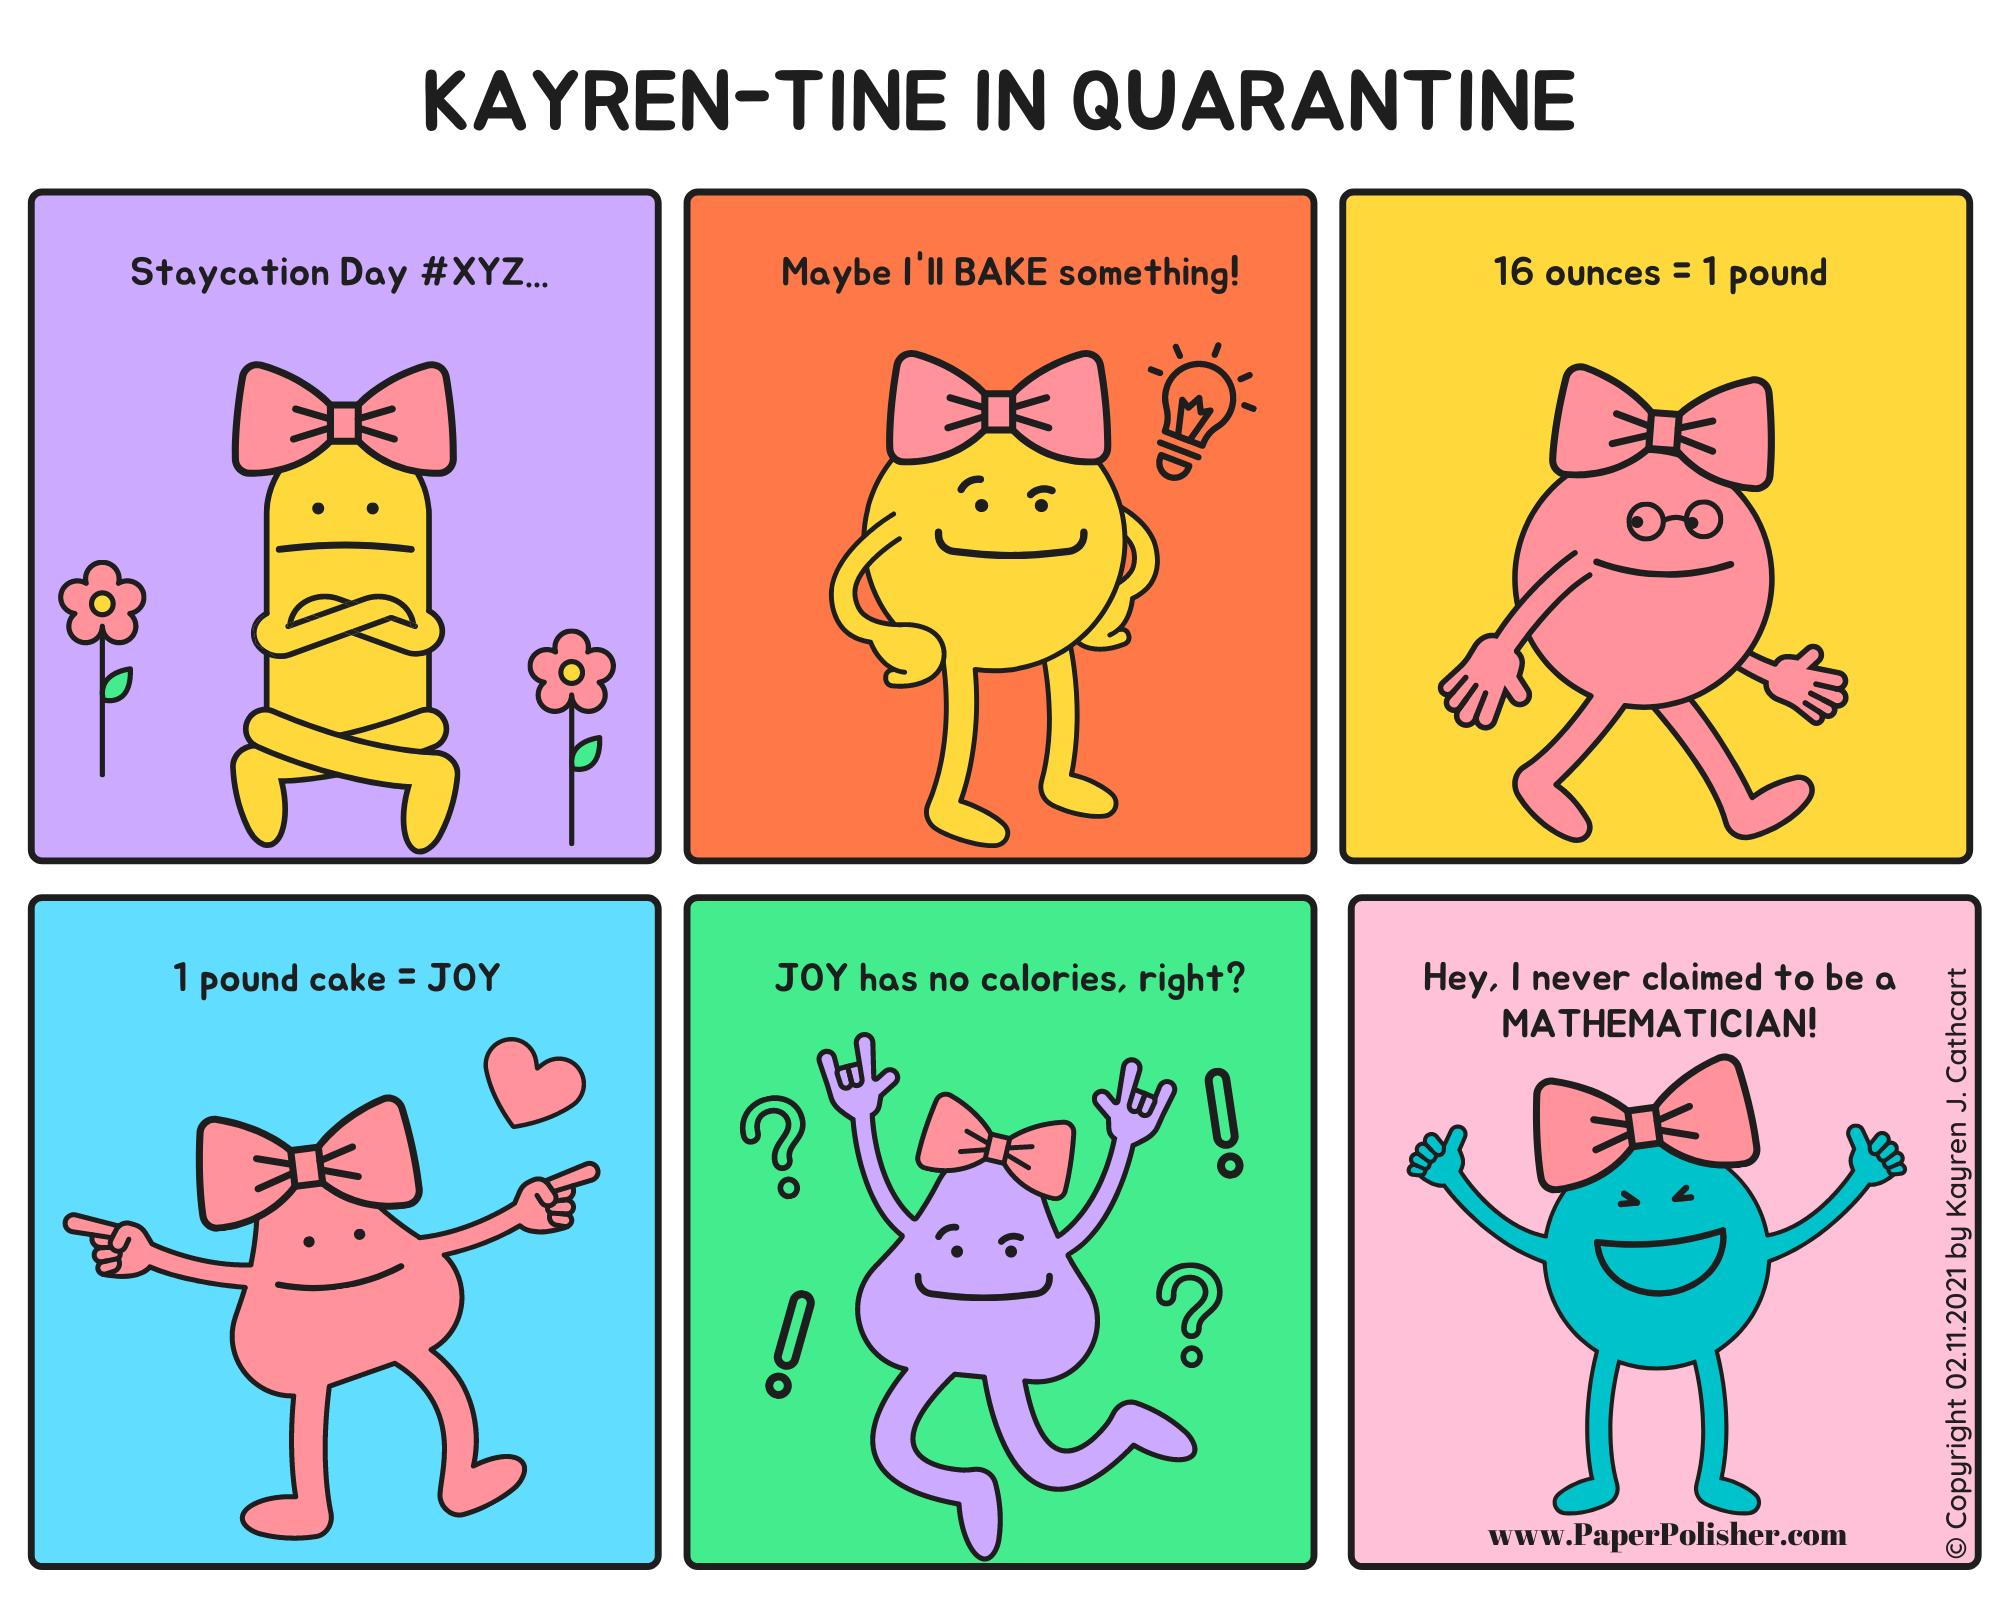 Kayren-Tine Comic Strip 02.11.2021